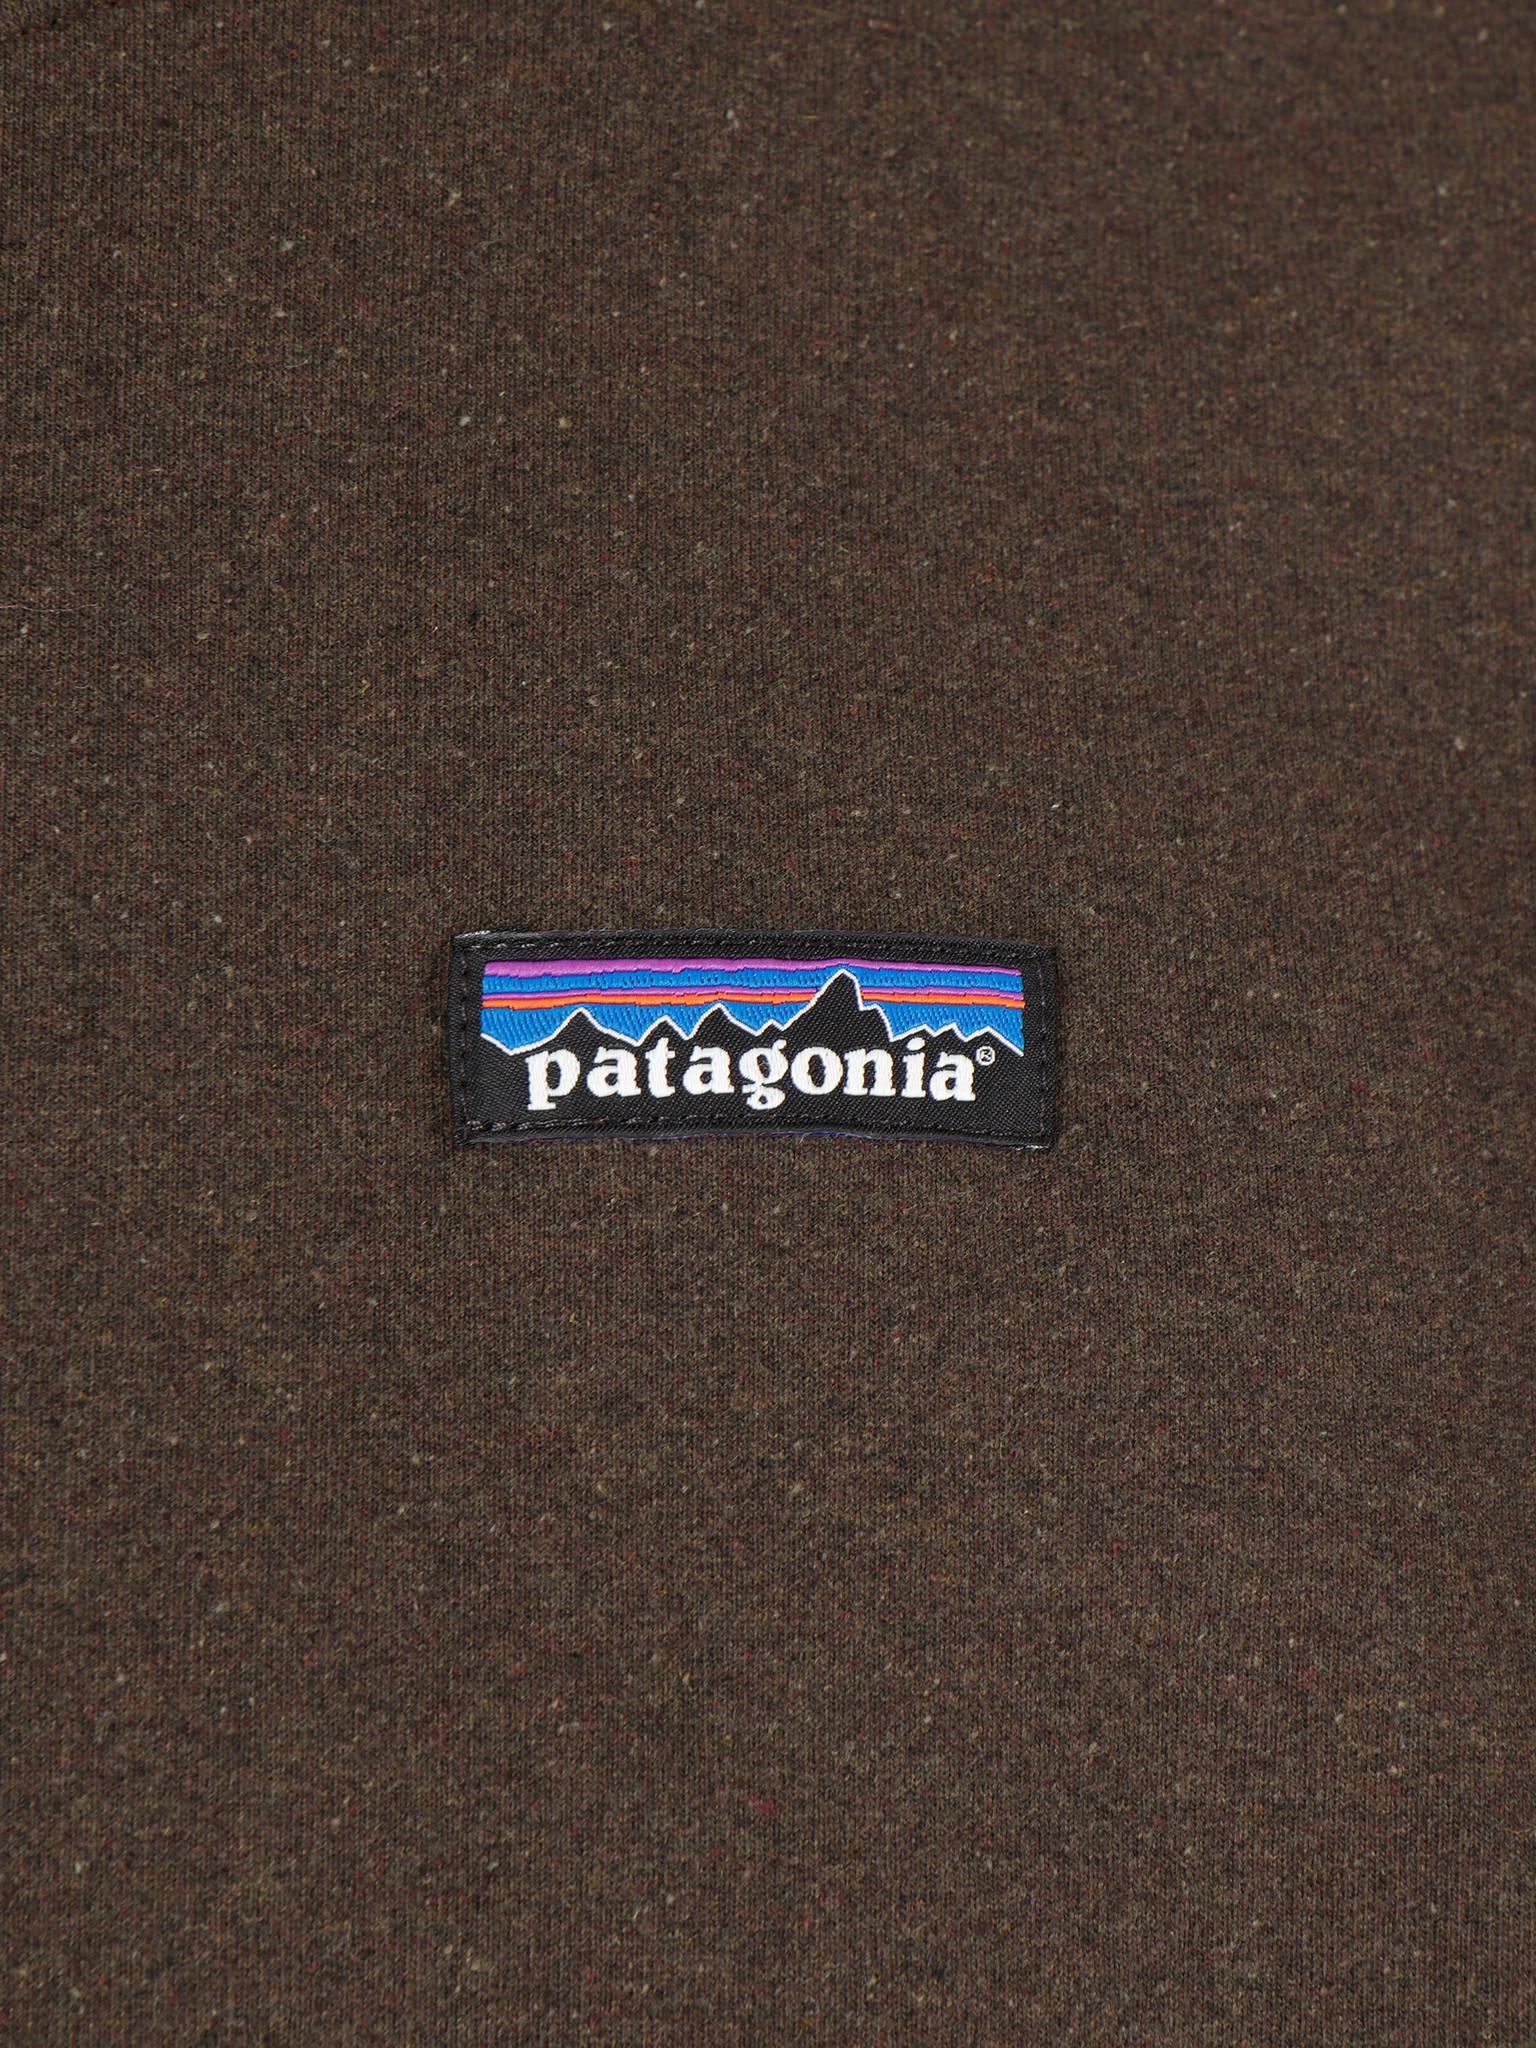 Patagonia Patagonia P-6 Label Uprisal Crew Sweatshirt Logwood Brown 39543